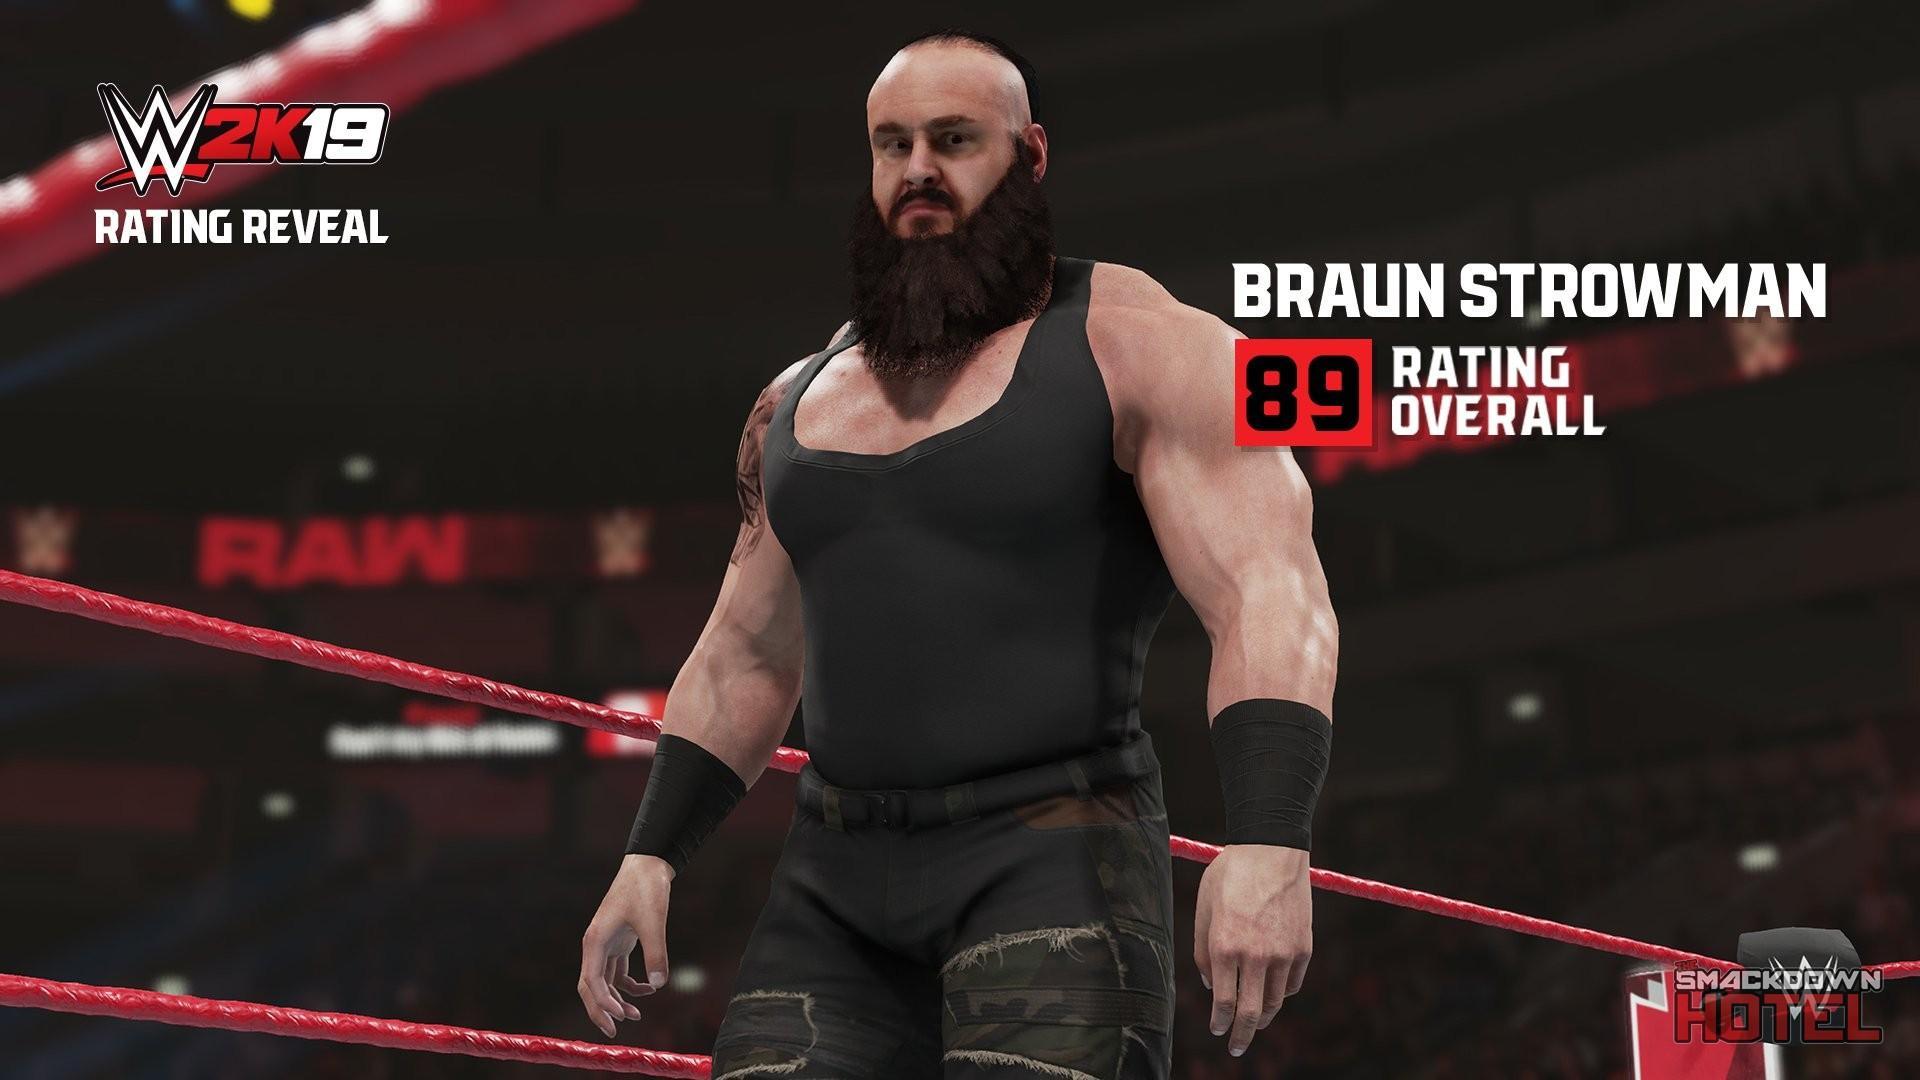 WWE2K19_RatingReveal_BraunStrowman-15343